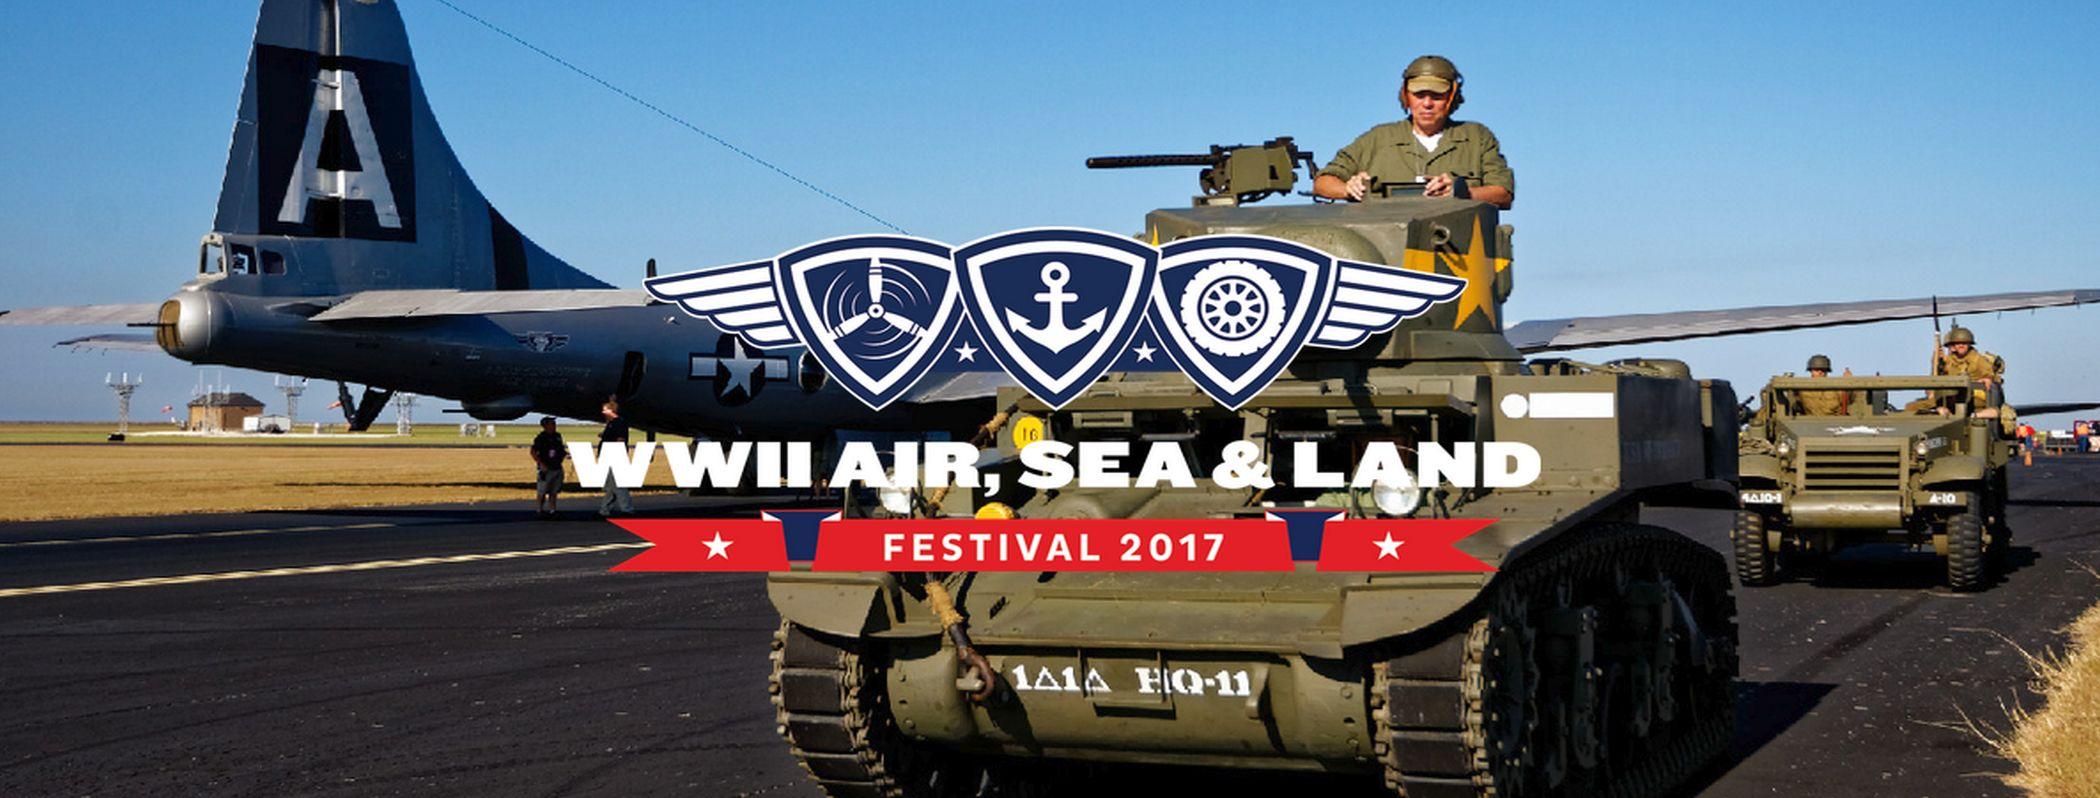 WWII Air Sea Land Fest